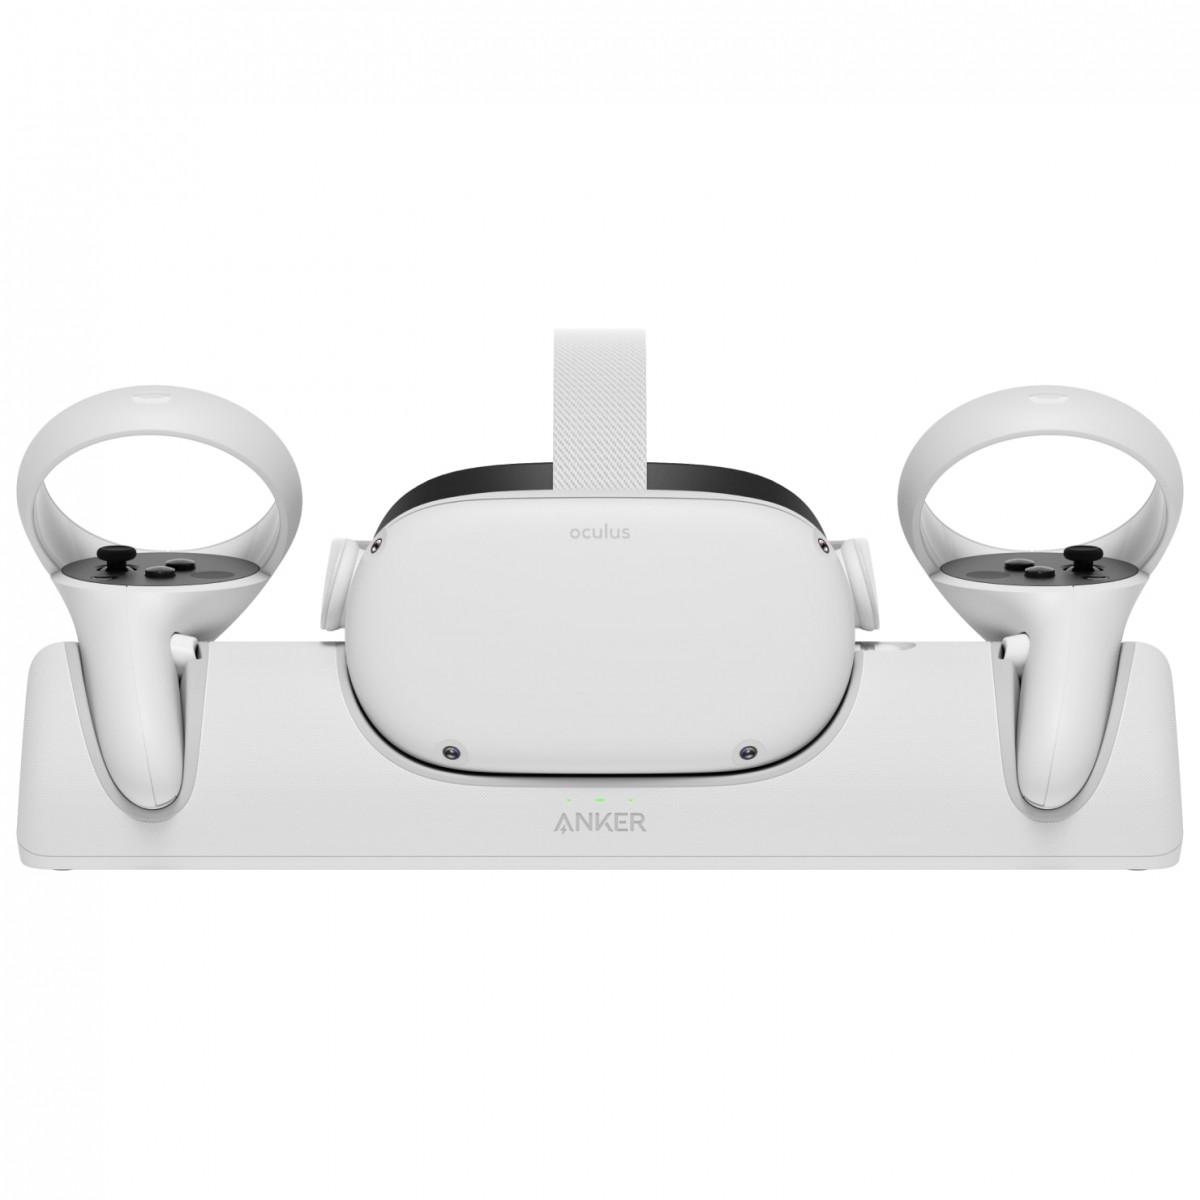 зарядная станция oculus quest 2 цена